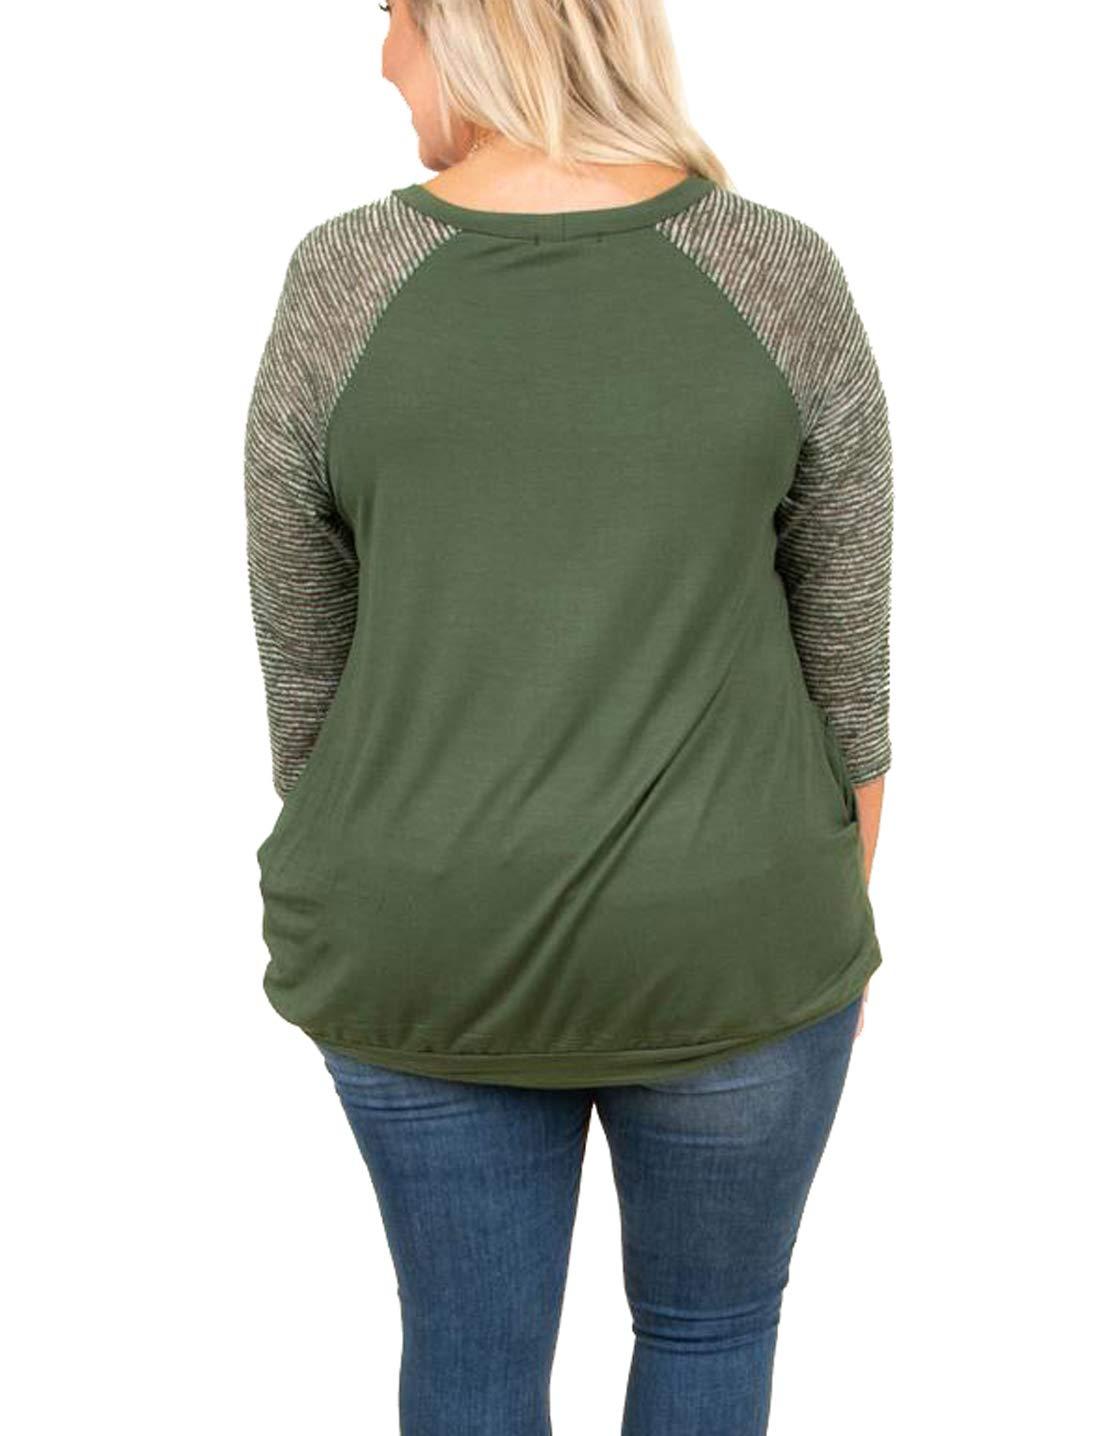 Rotita Women Raglan Sweatshirt Plus Size Striped 3/4 Sleeve Lightweight Casual Loose Pullover by Rotita (Image #2)